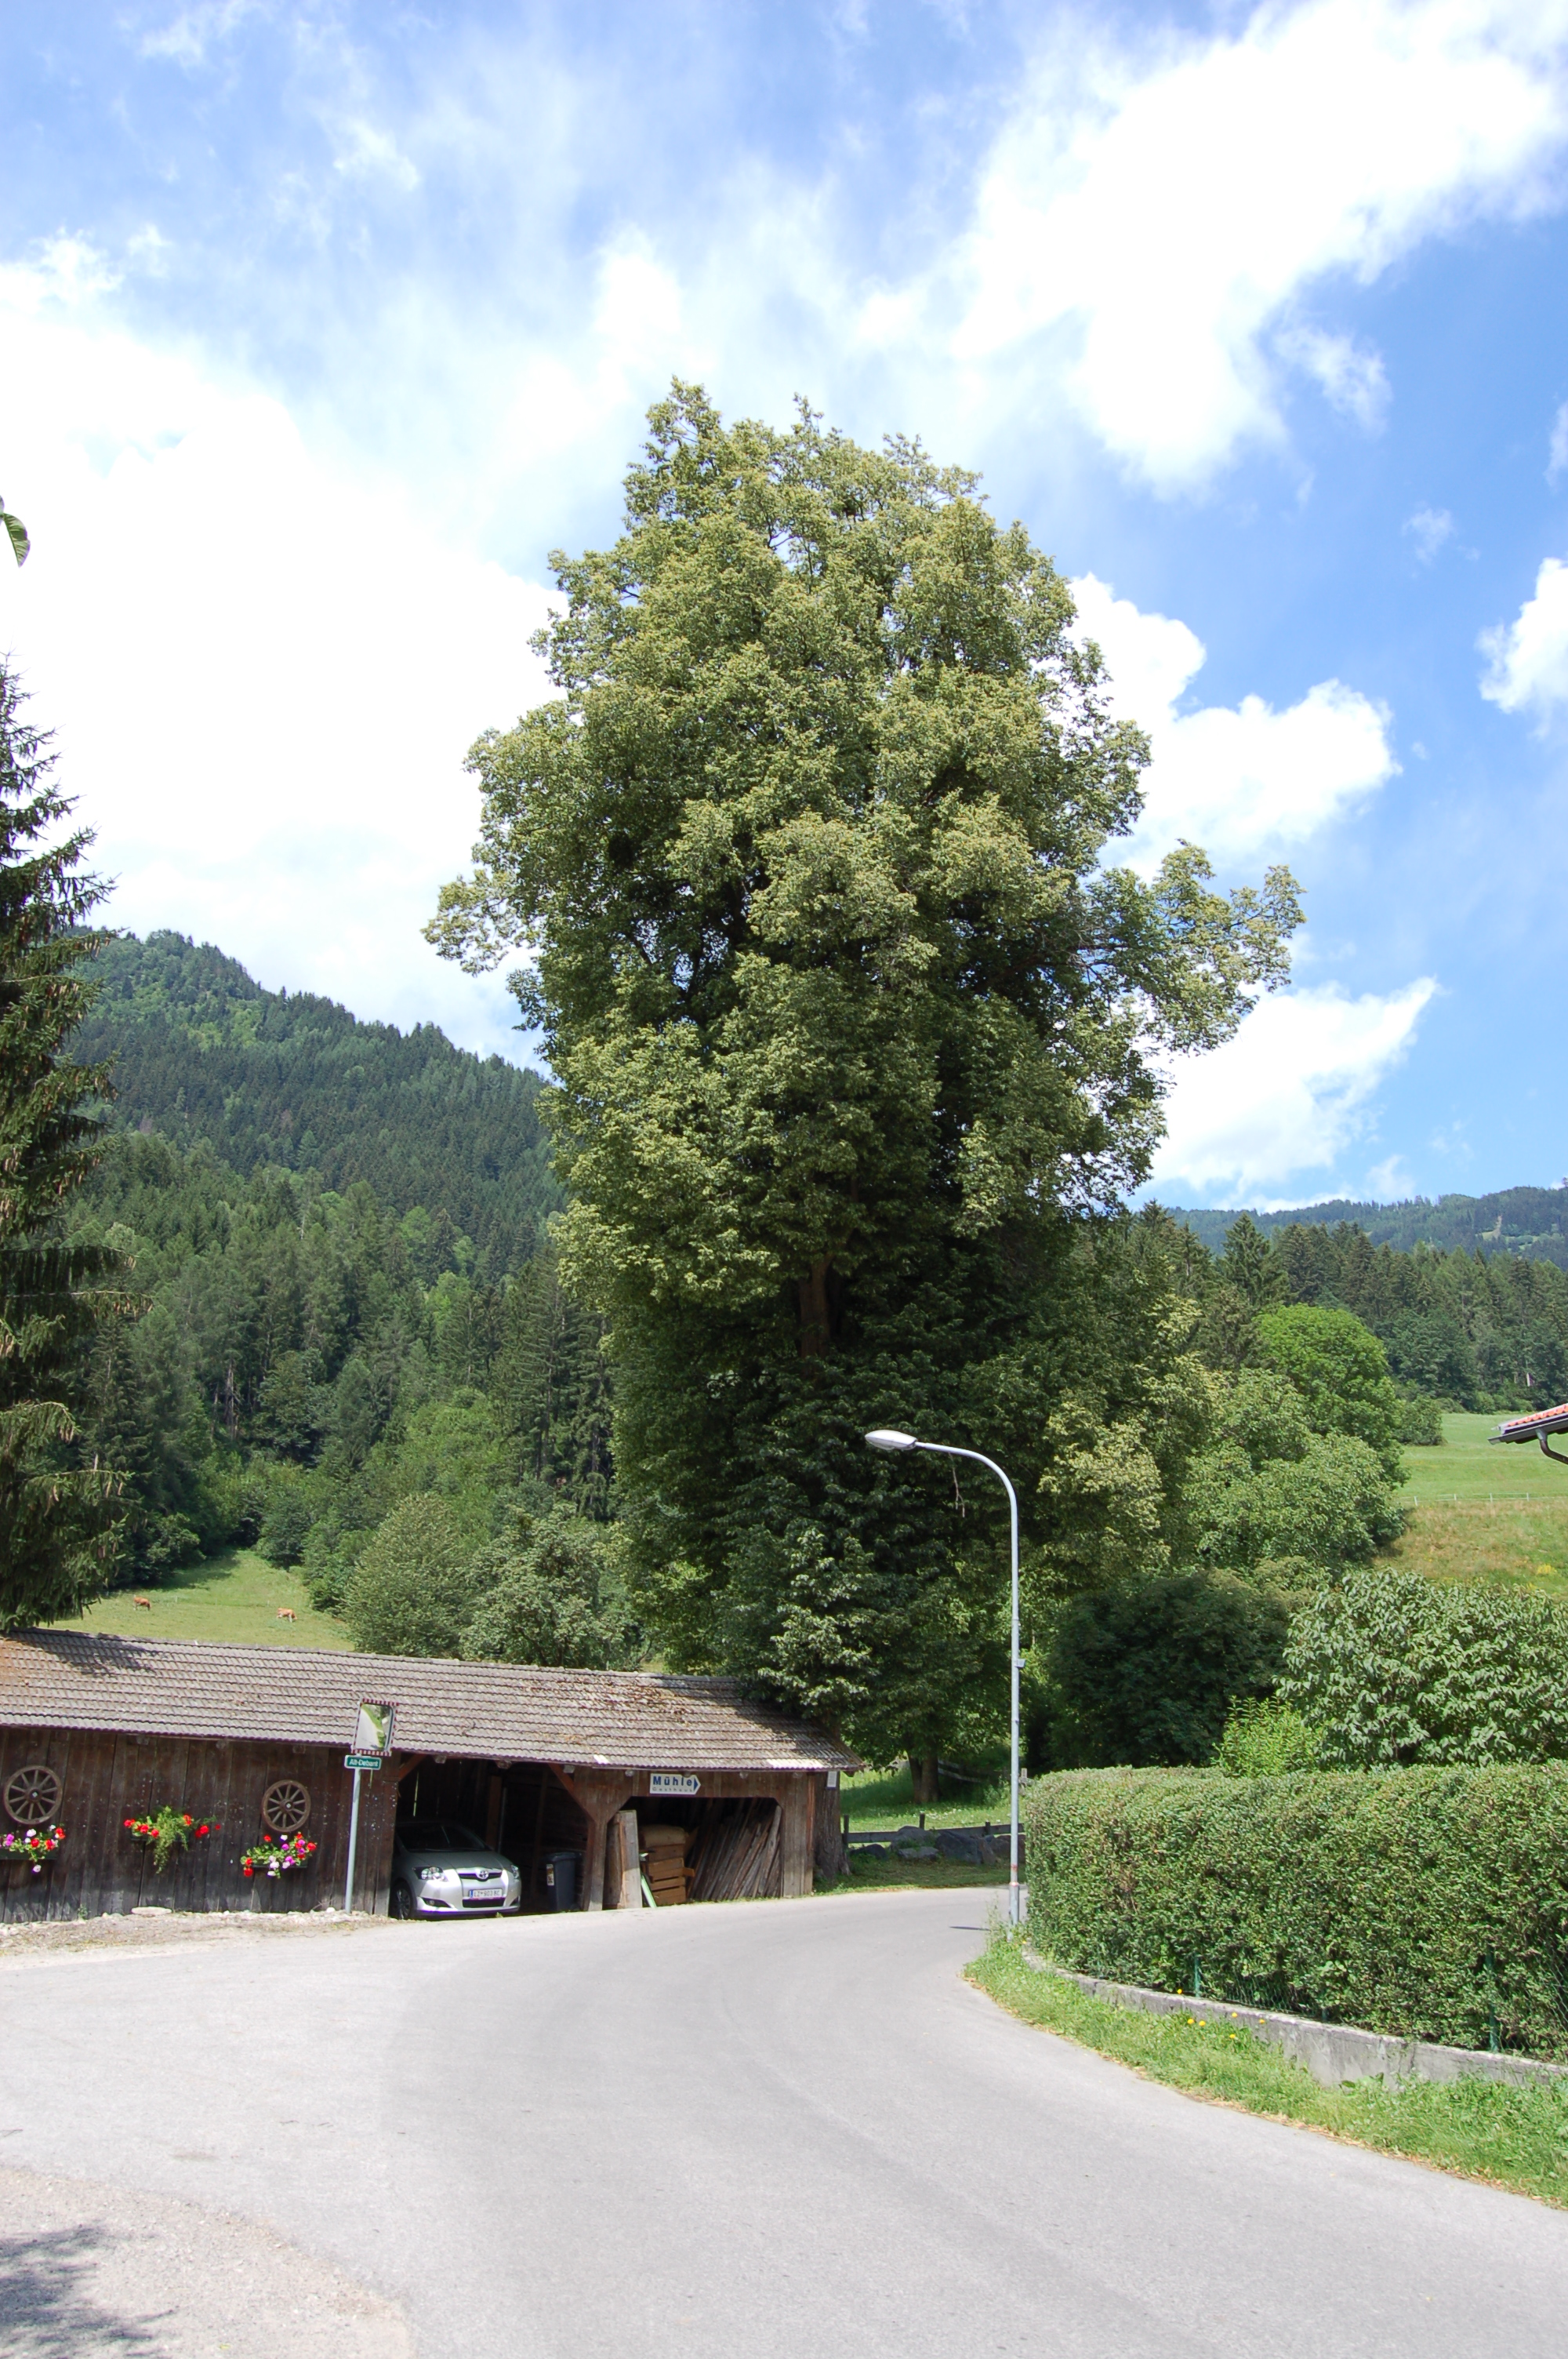 Datei:Nudorf-Debant - Linde in Alt-Debant rematesbancarios.com Wikipedia